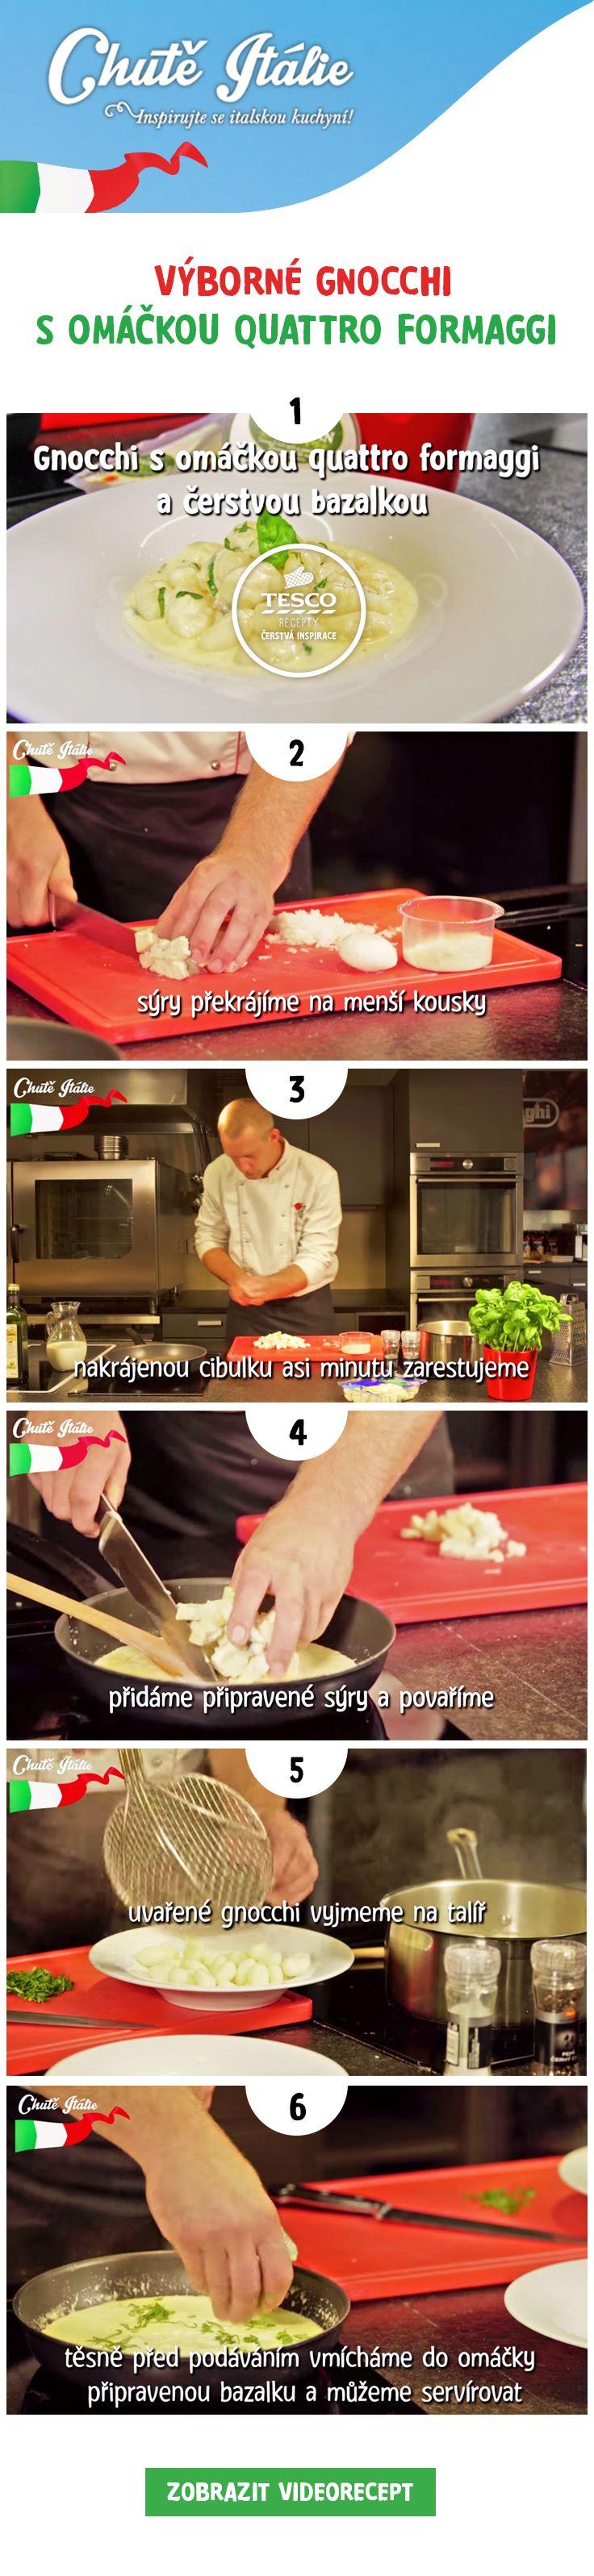 Připravte si italské gnocchi s omáčkou quattro formaggi!